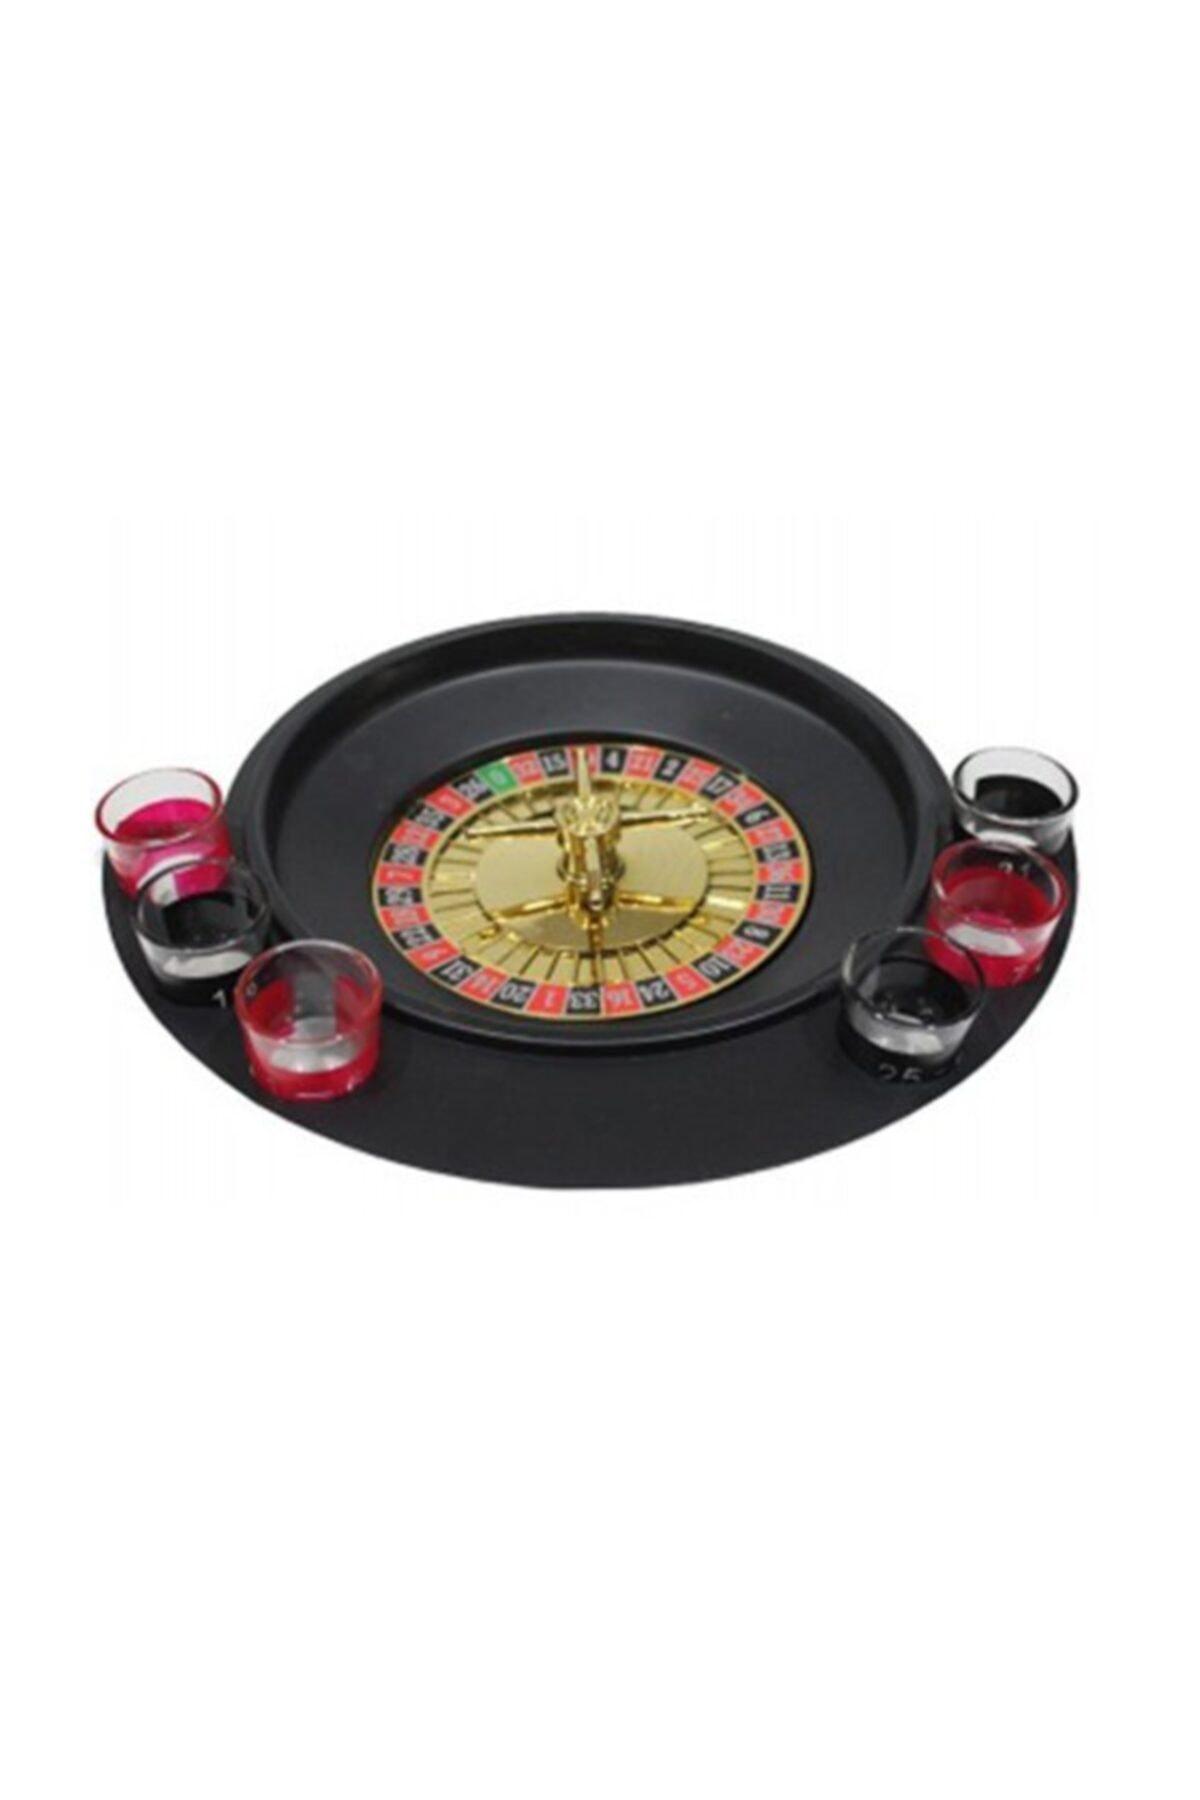 6 Shot Bardaklı Rus Ruleti Drinking Roulette Tekila İçki Oyun Seti